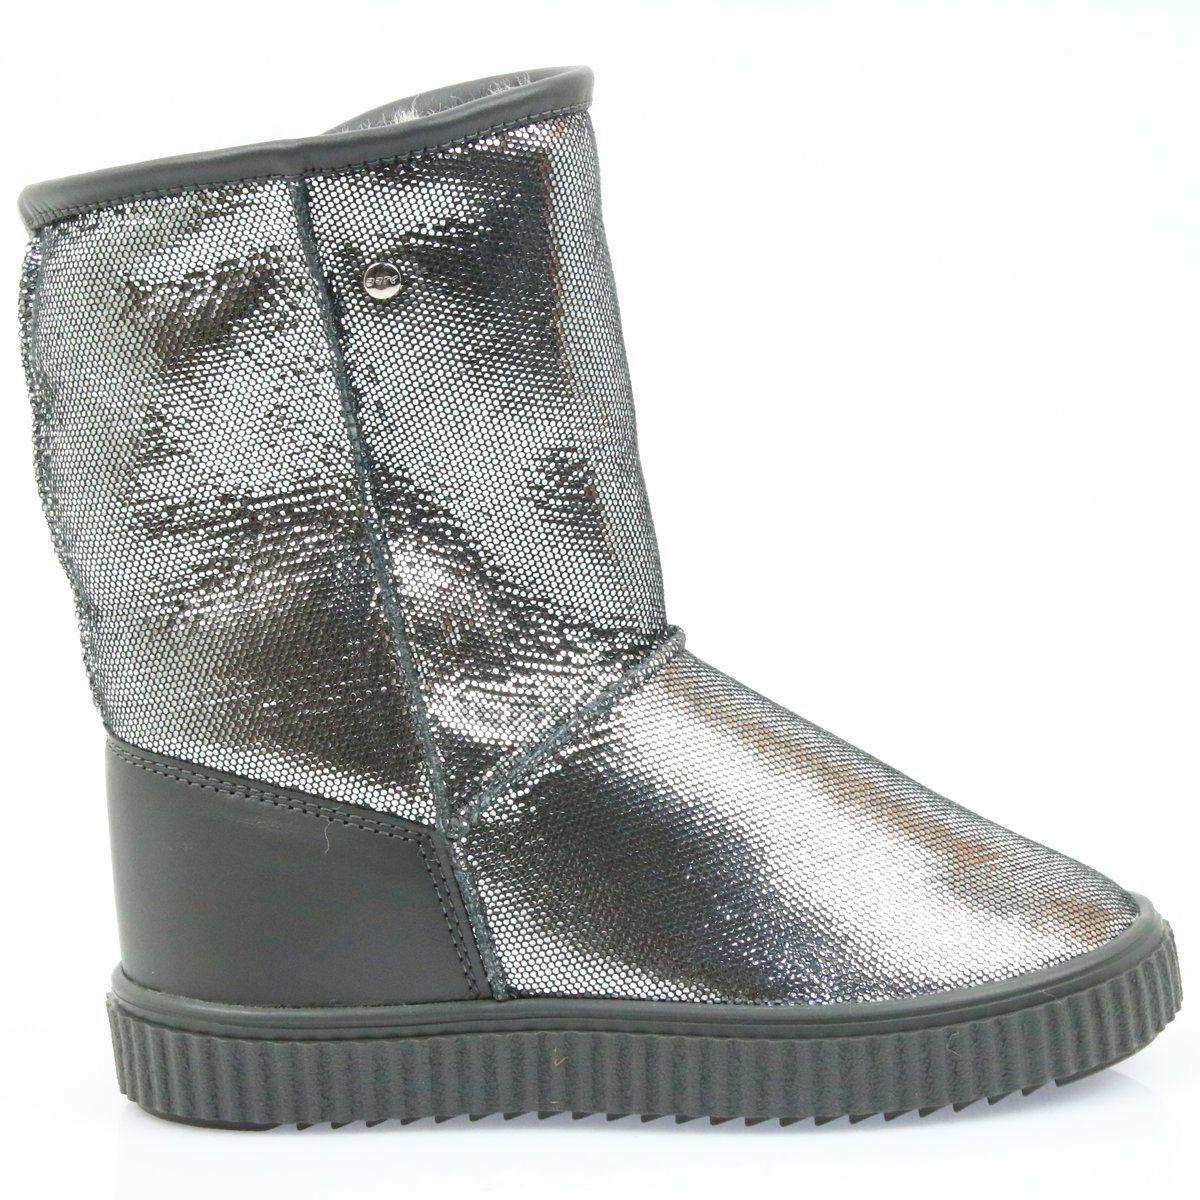 Kozaki Dla Dzieci Bartek Szare Kozaki Bartek 47750 Naturalna Welna Boots Ugg Boots Uggs